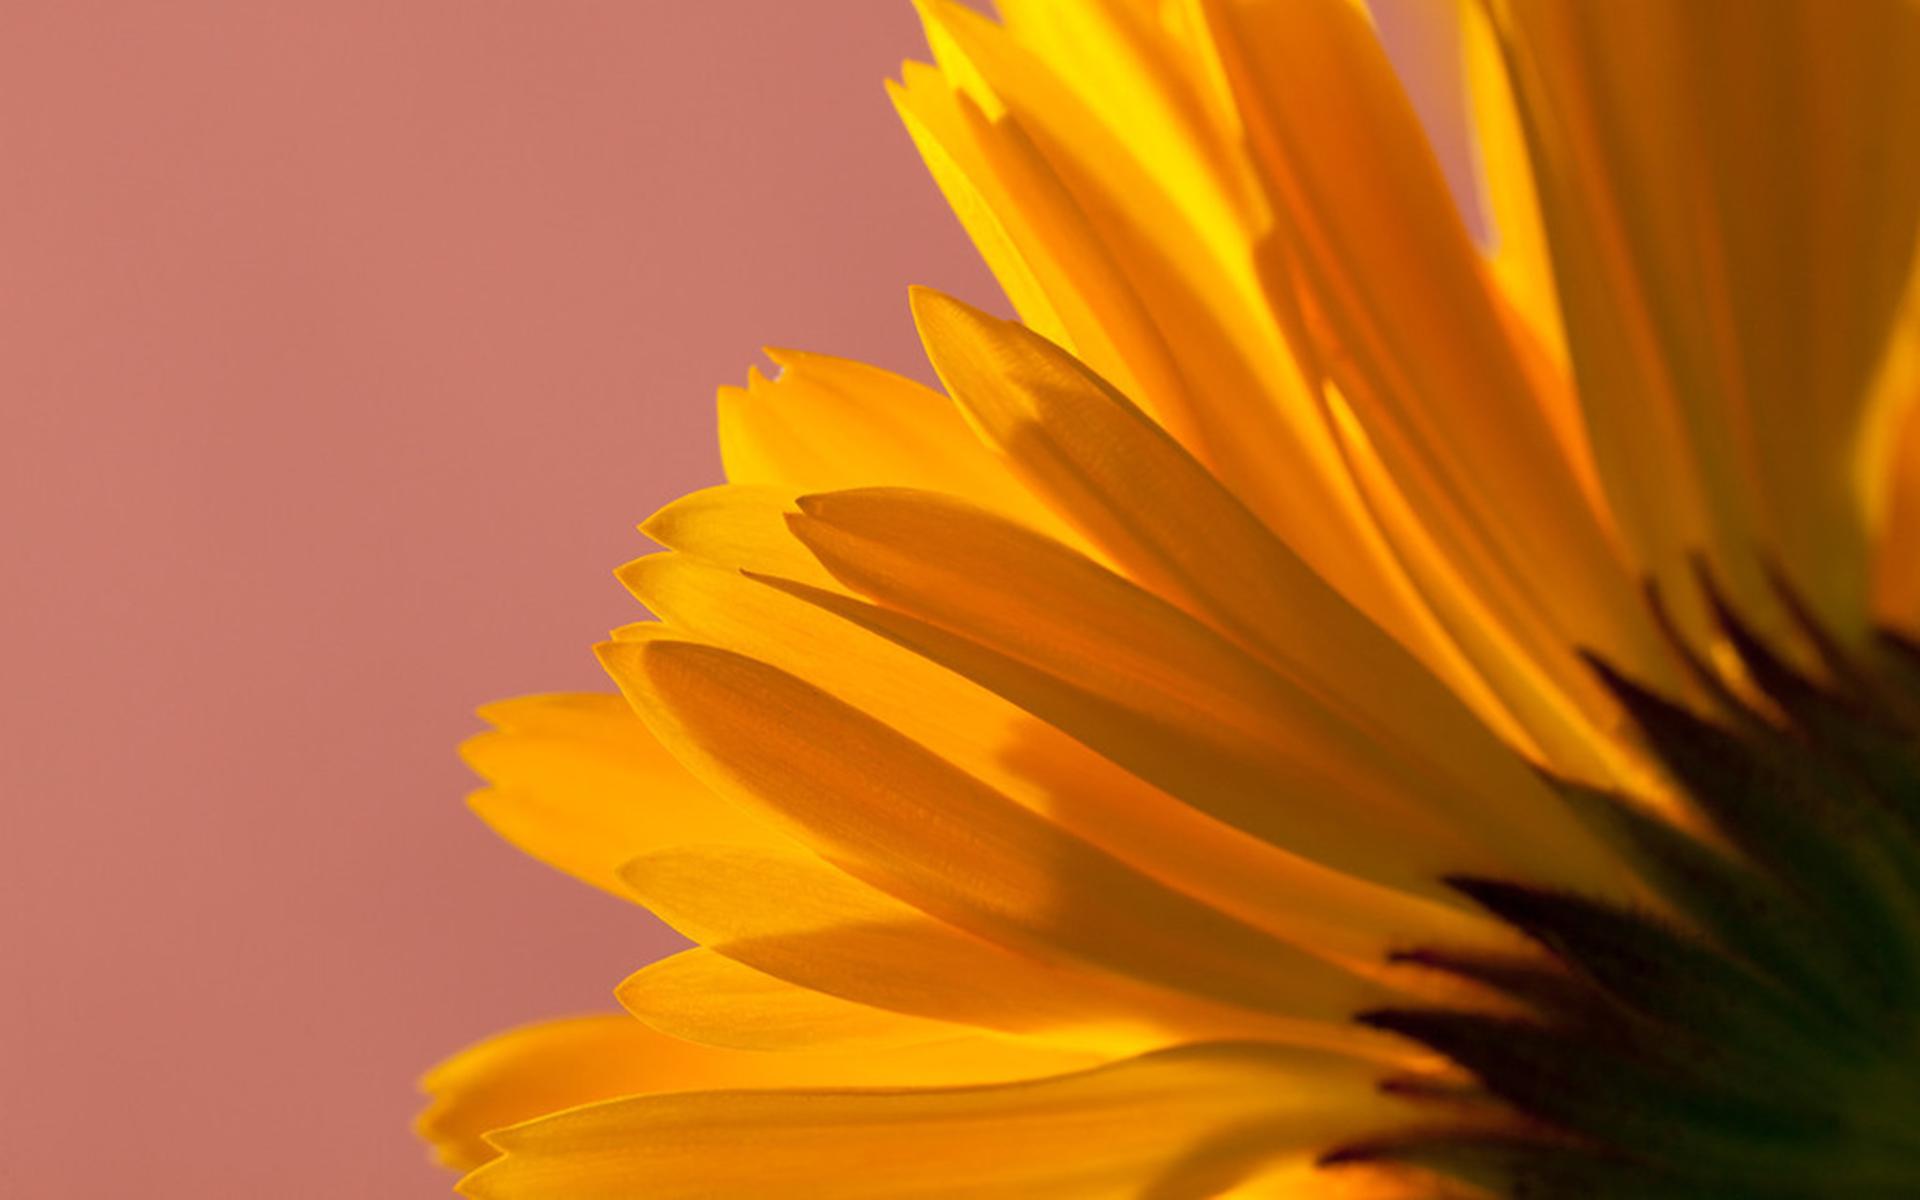 Fondo De Pantalla 1920x1200 Id: Sunflower Fondo De Pantalla HD